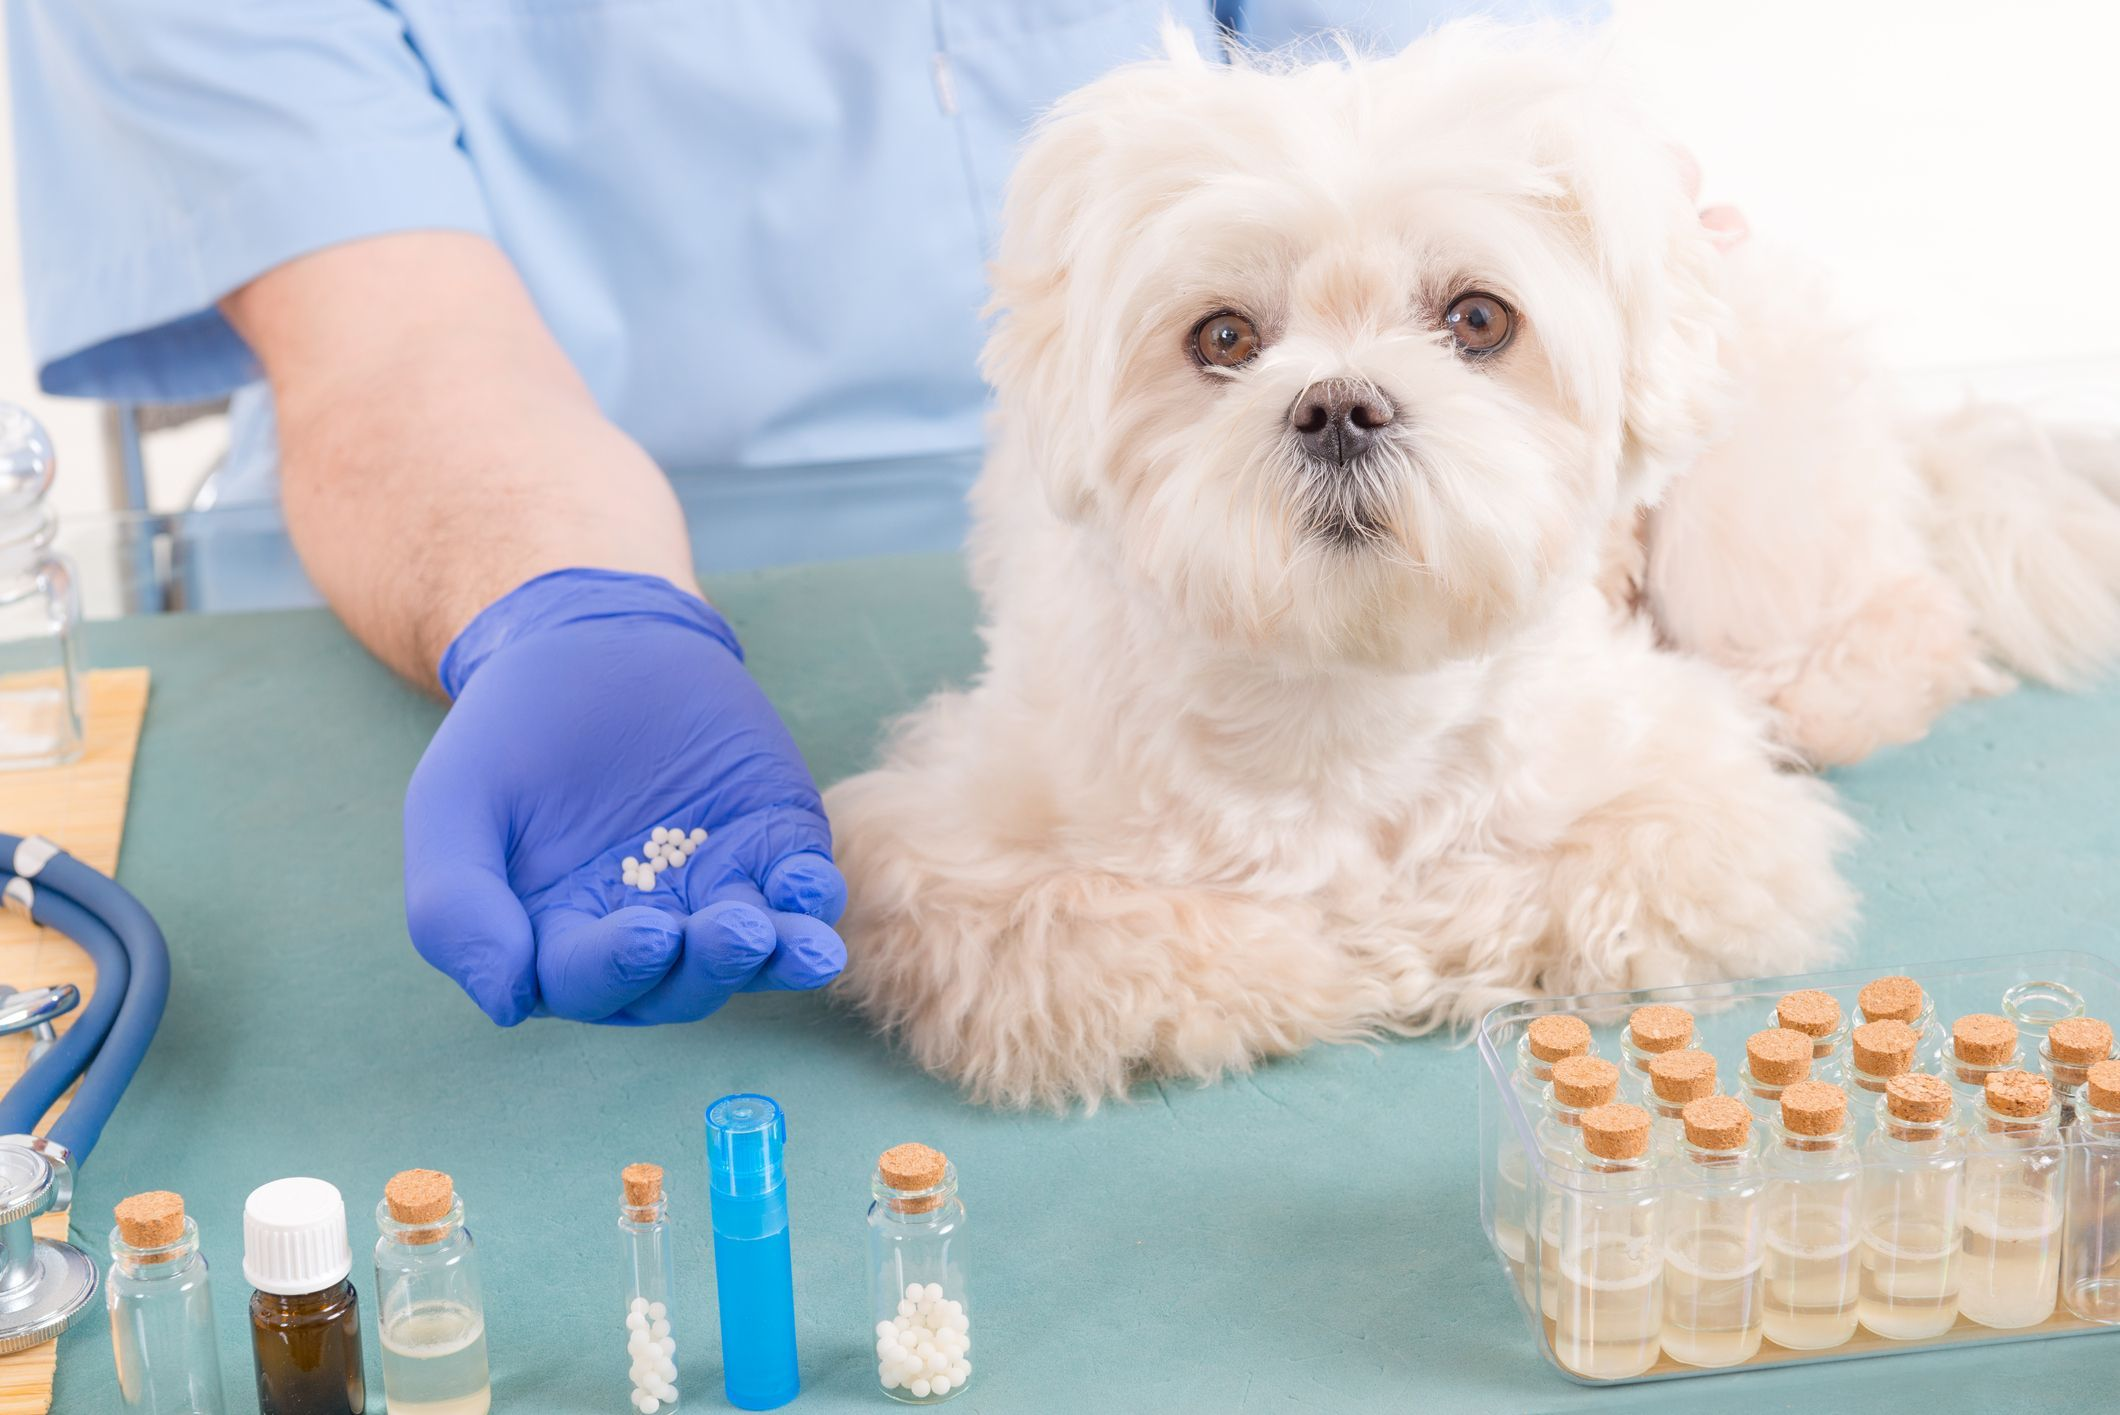 Homéopathie pour mon chien - Doctissimo